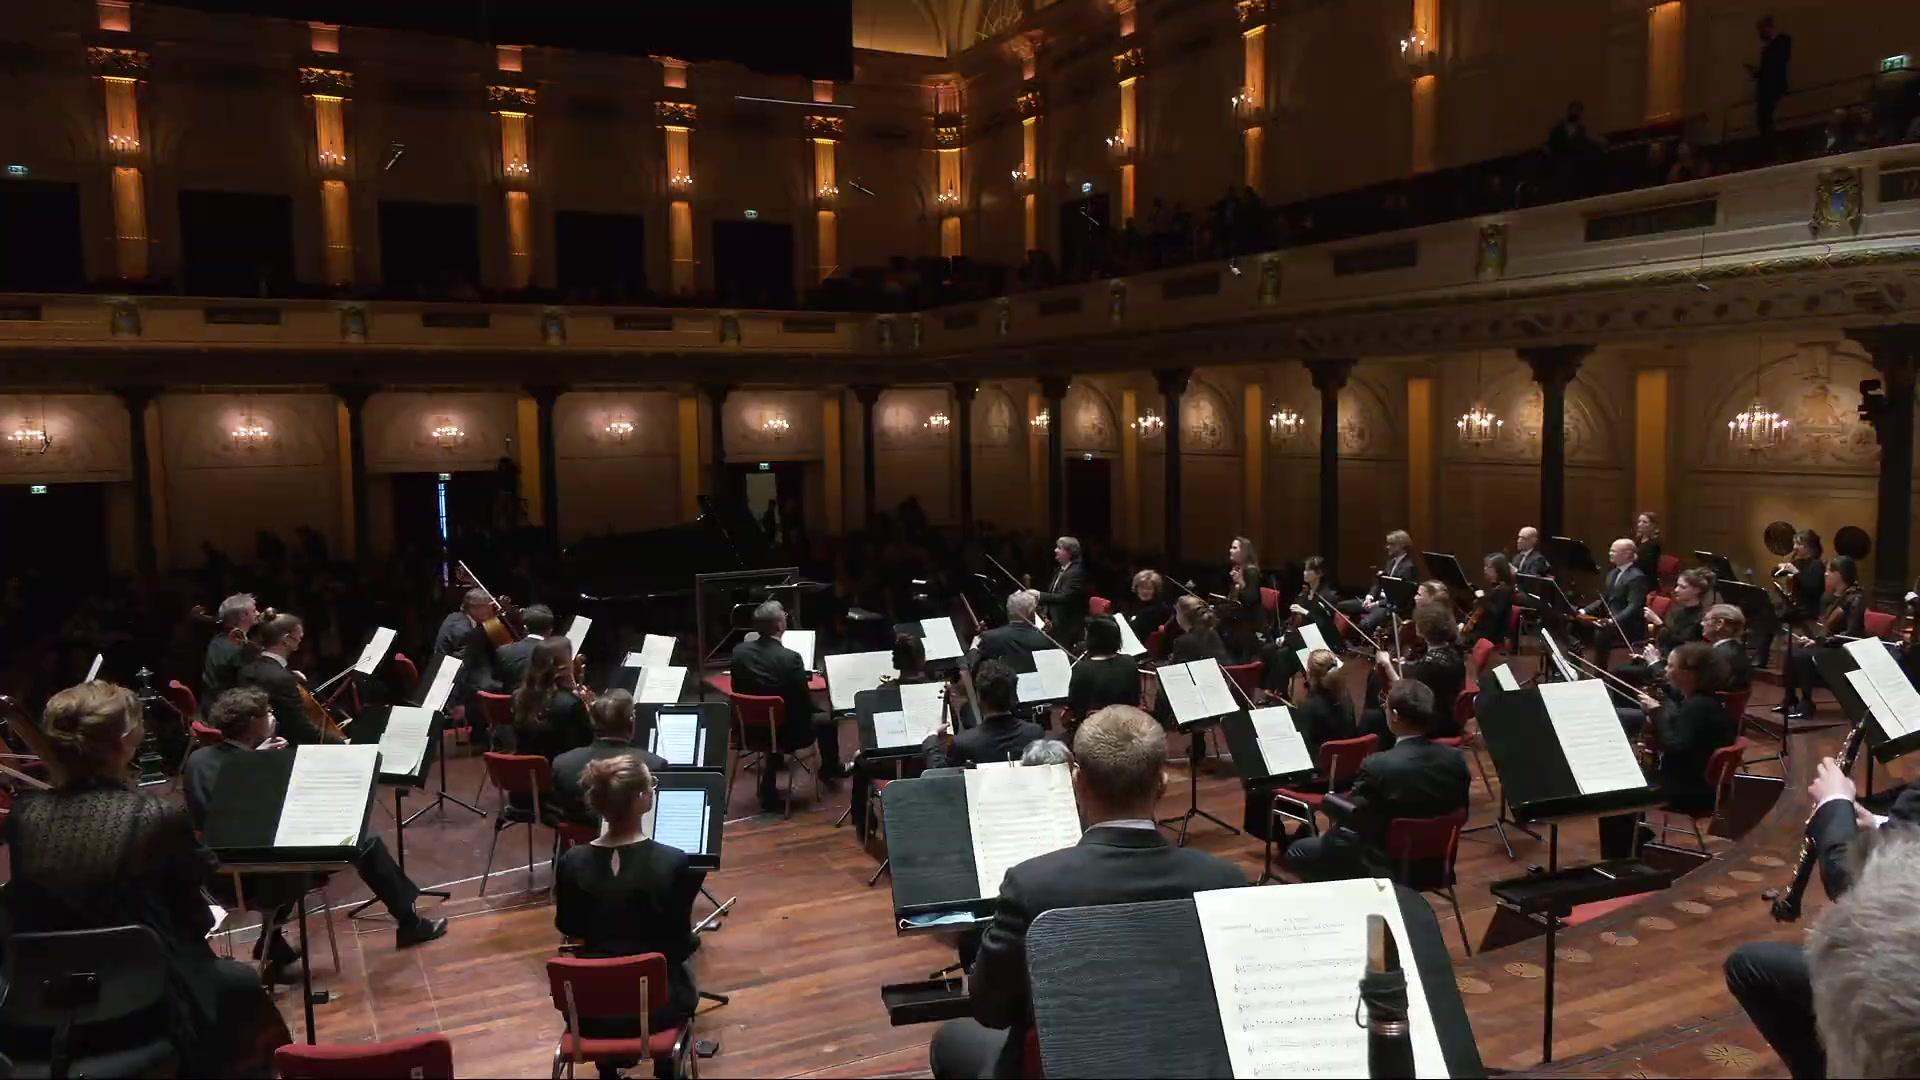 2021.04.16 RCO皇家音乐厅管弦乐团、帕沃雅尔维&奥拉夫松 莫扎特《第24钢协》舒曼《第三交响曲》Concertgebouworkest